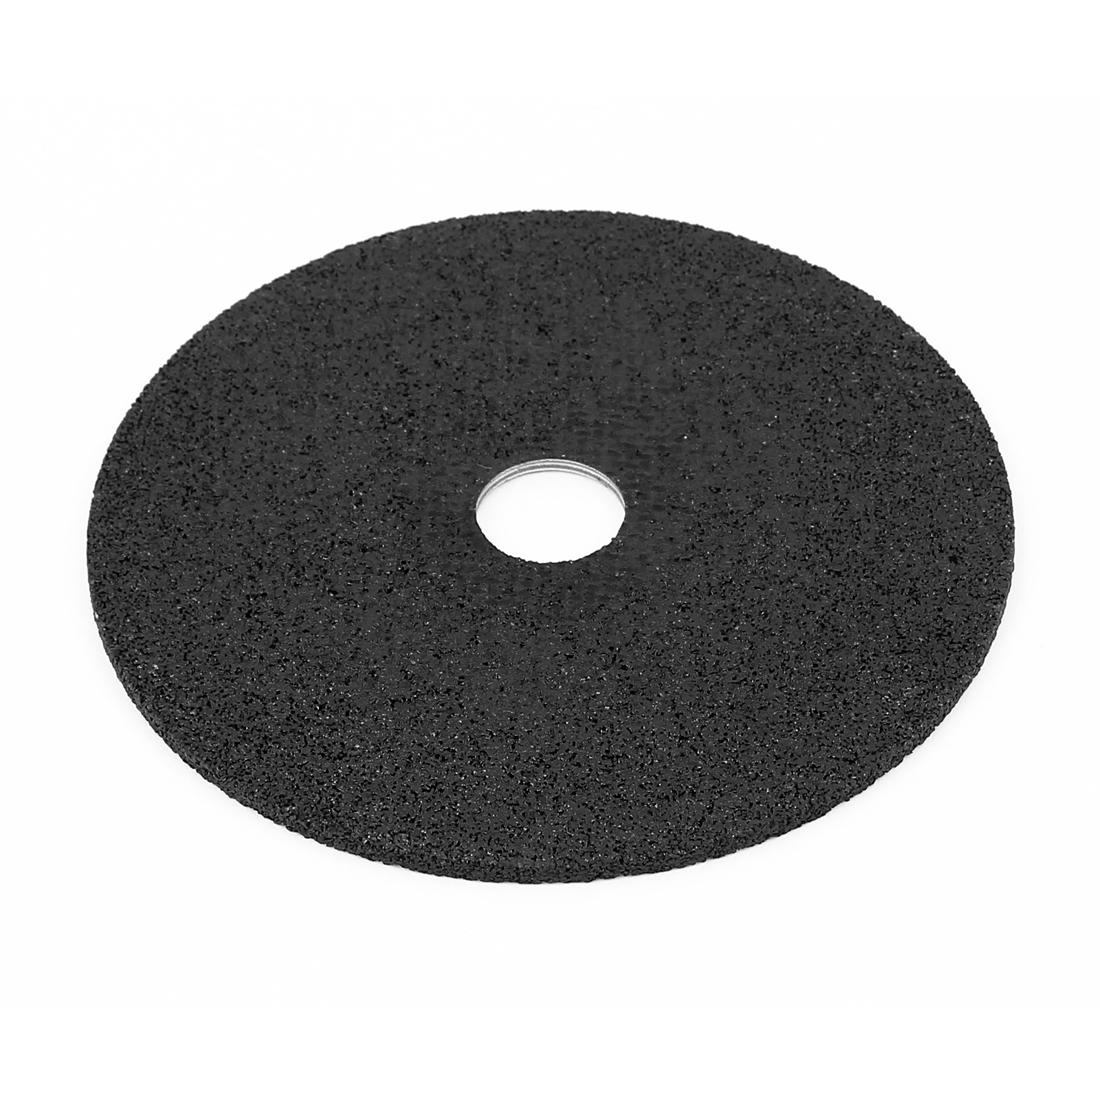 Metal Abrasives Slice Grinding Cutting Disc Wheel Tool 100mmx16mmx2.5mm